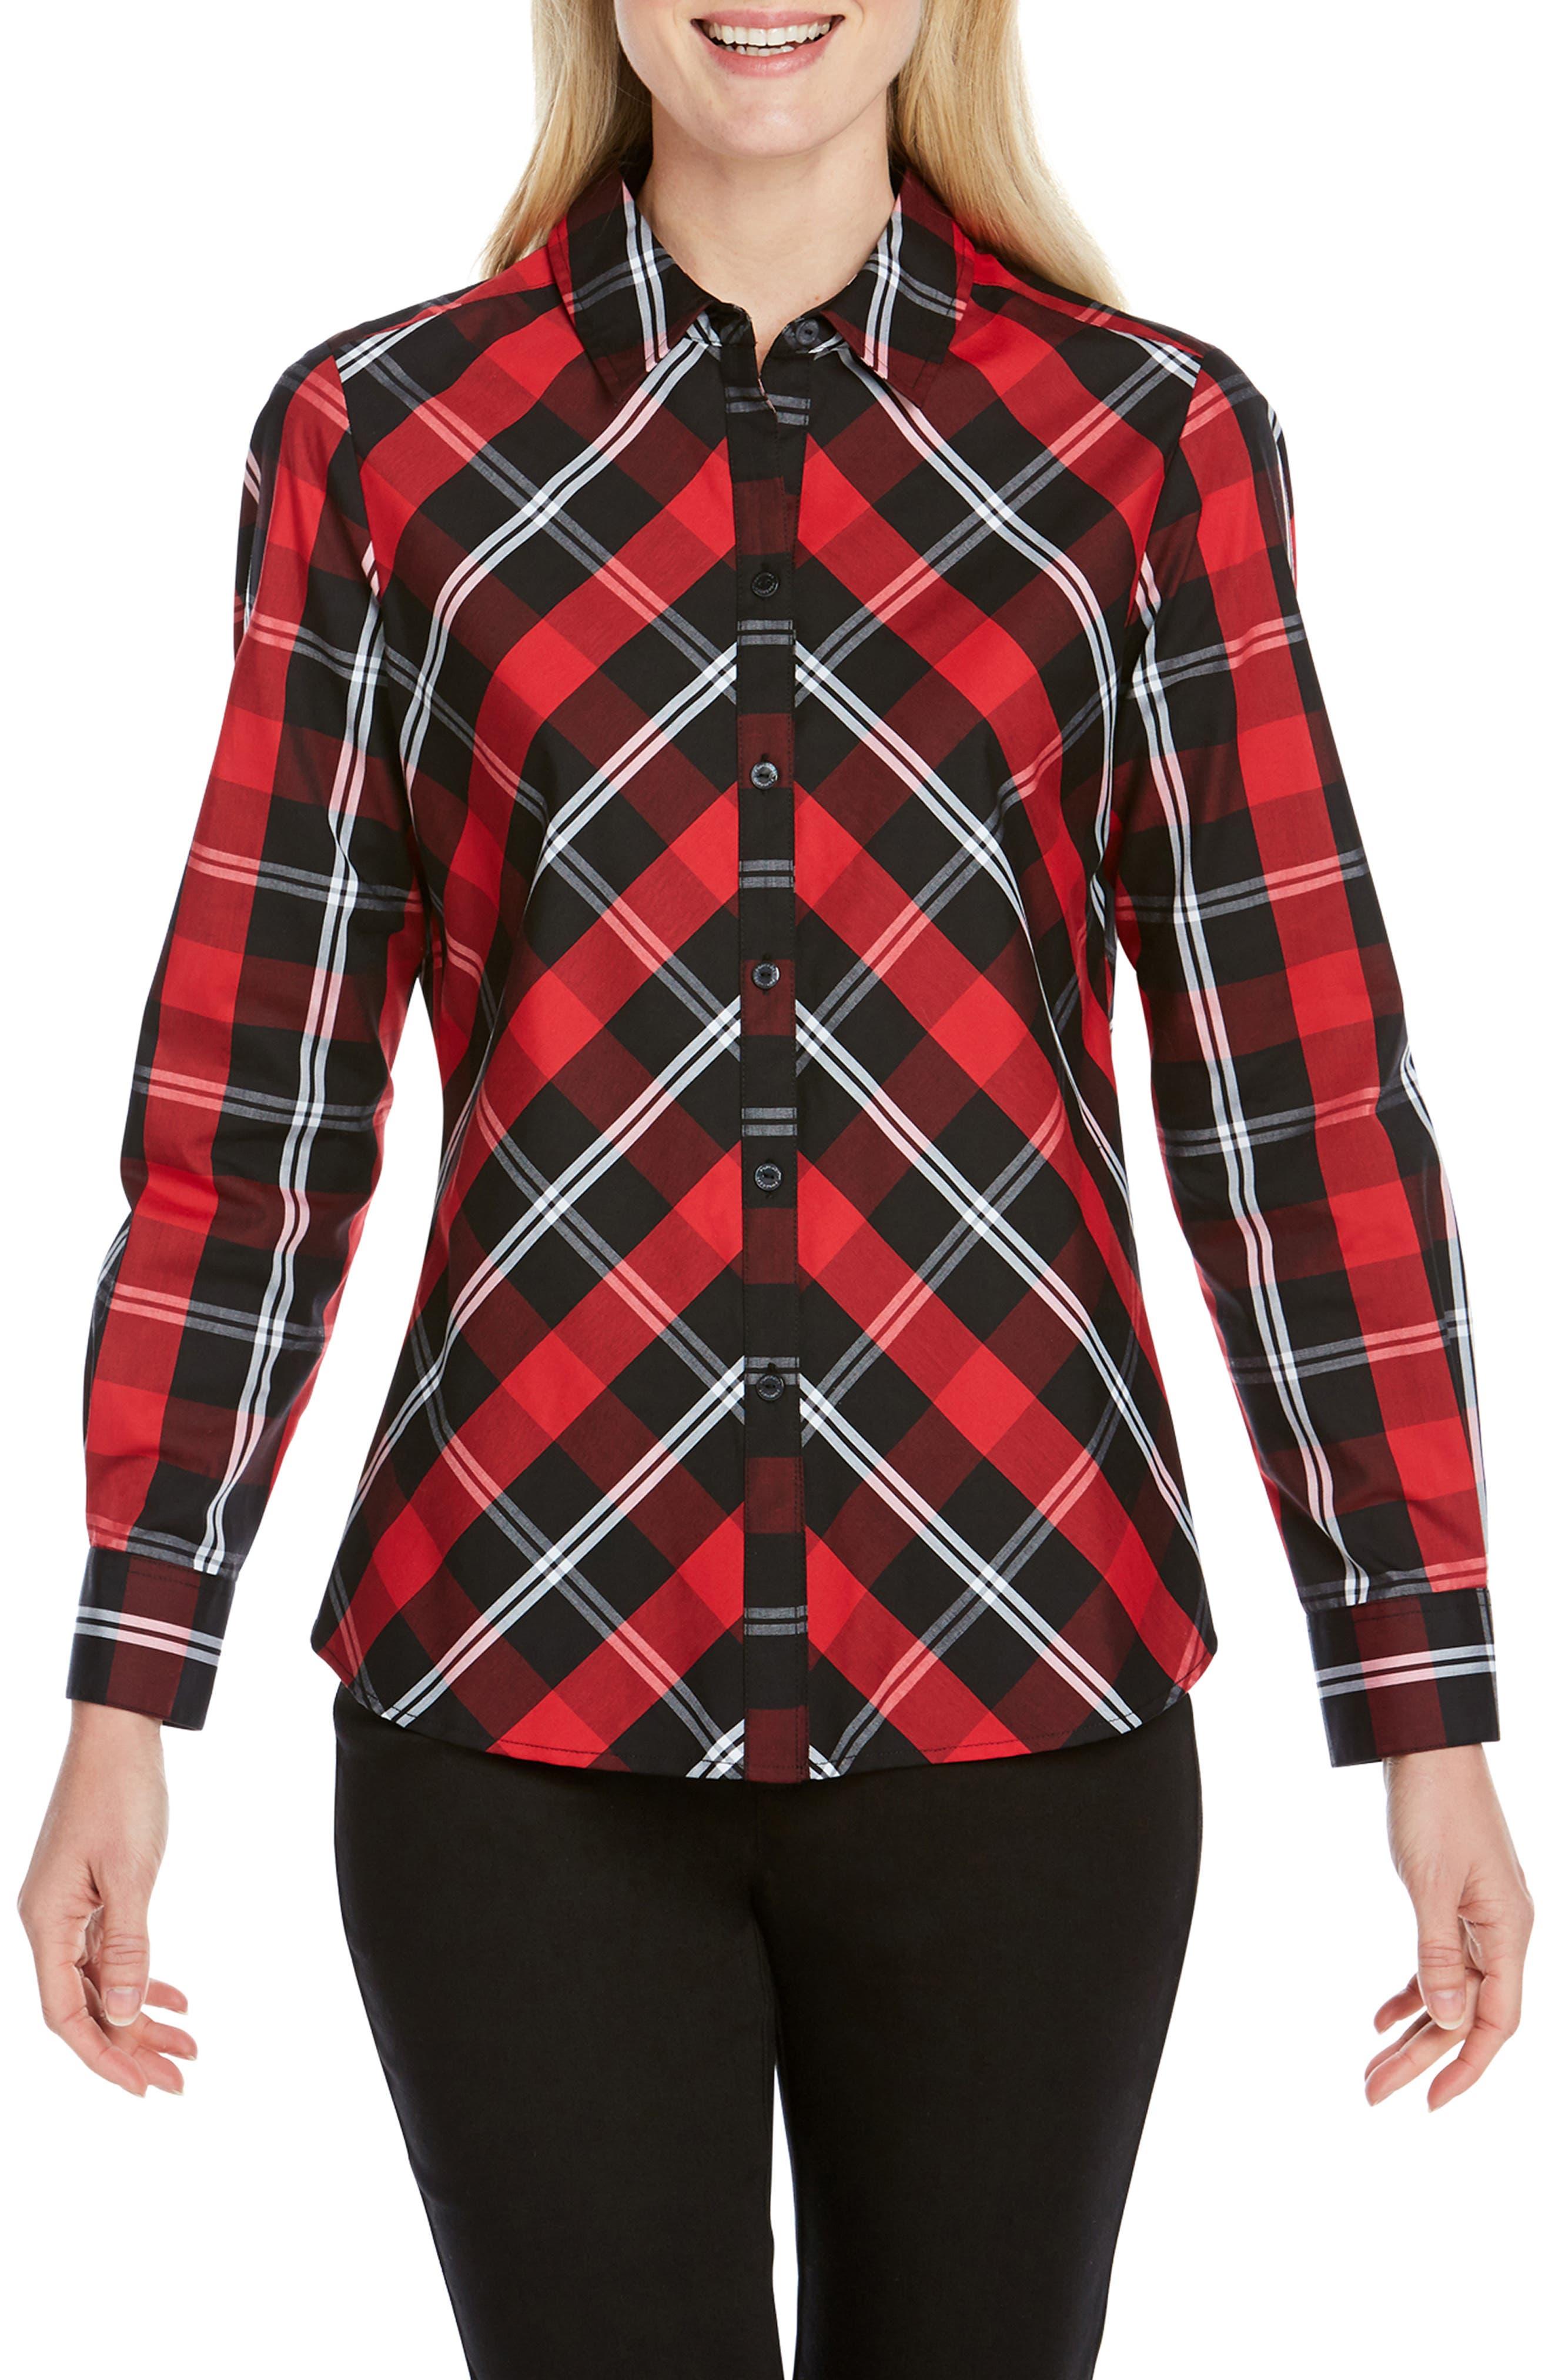 Foxcroft Tina Mackenzie Tartan Shirt, Red